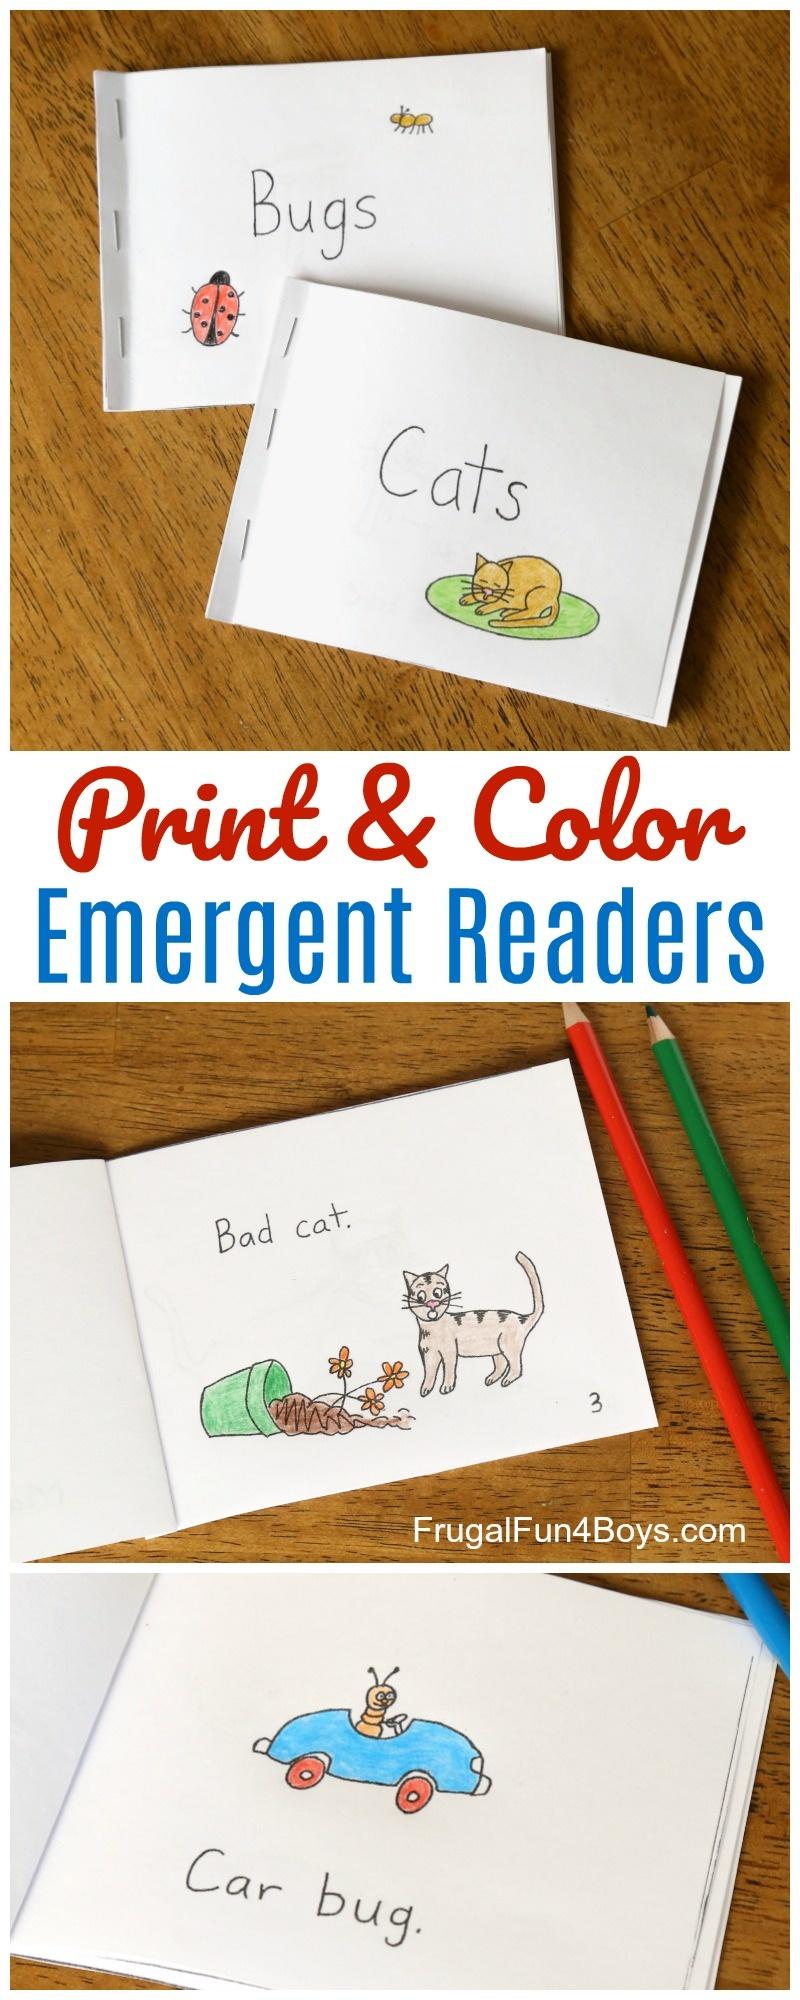 Free Printable Books For Beginning Readers - Level 1 (Easy) - Frugal - Free Printable Books For Beginning Readers